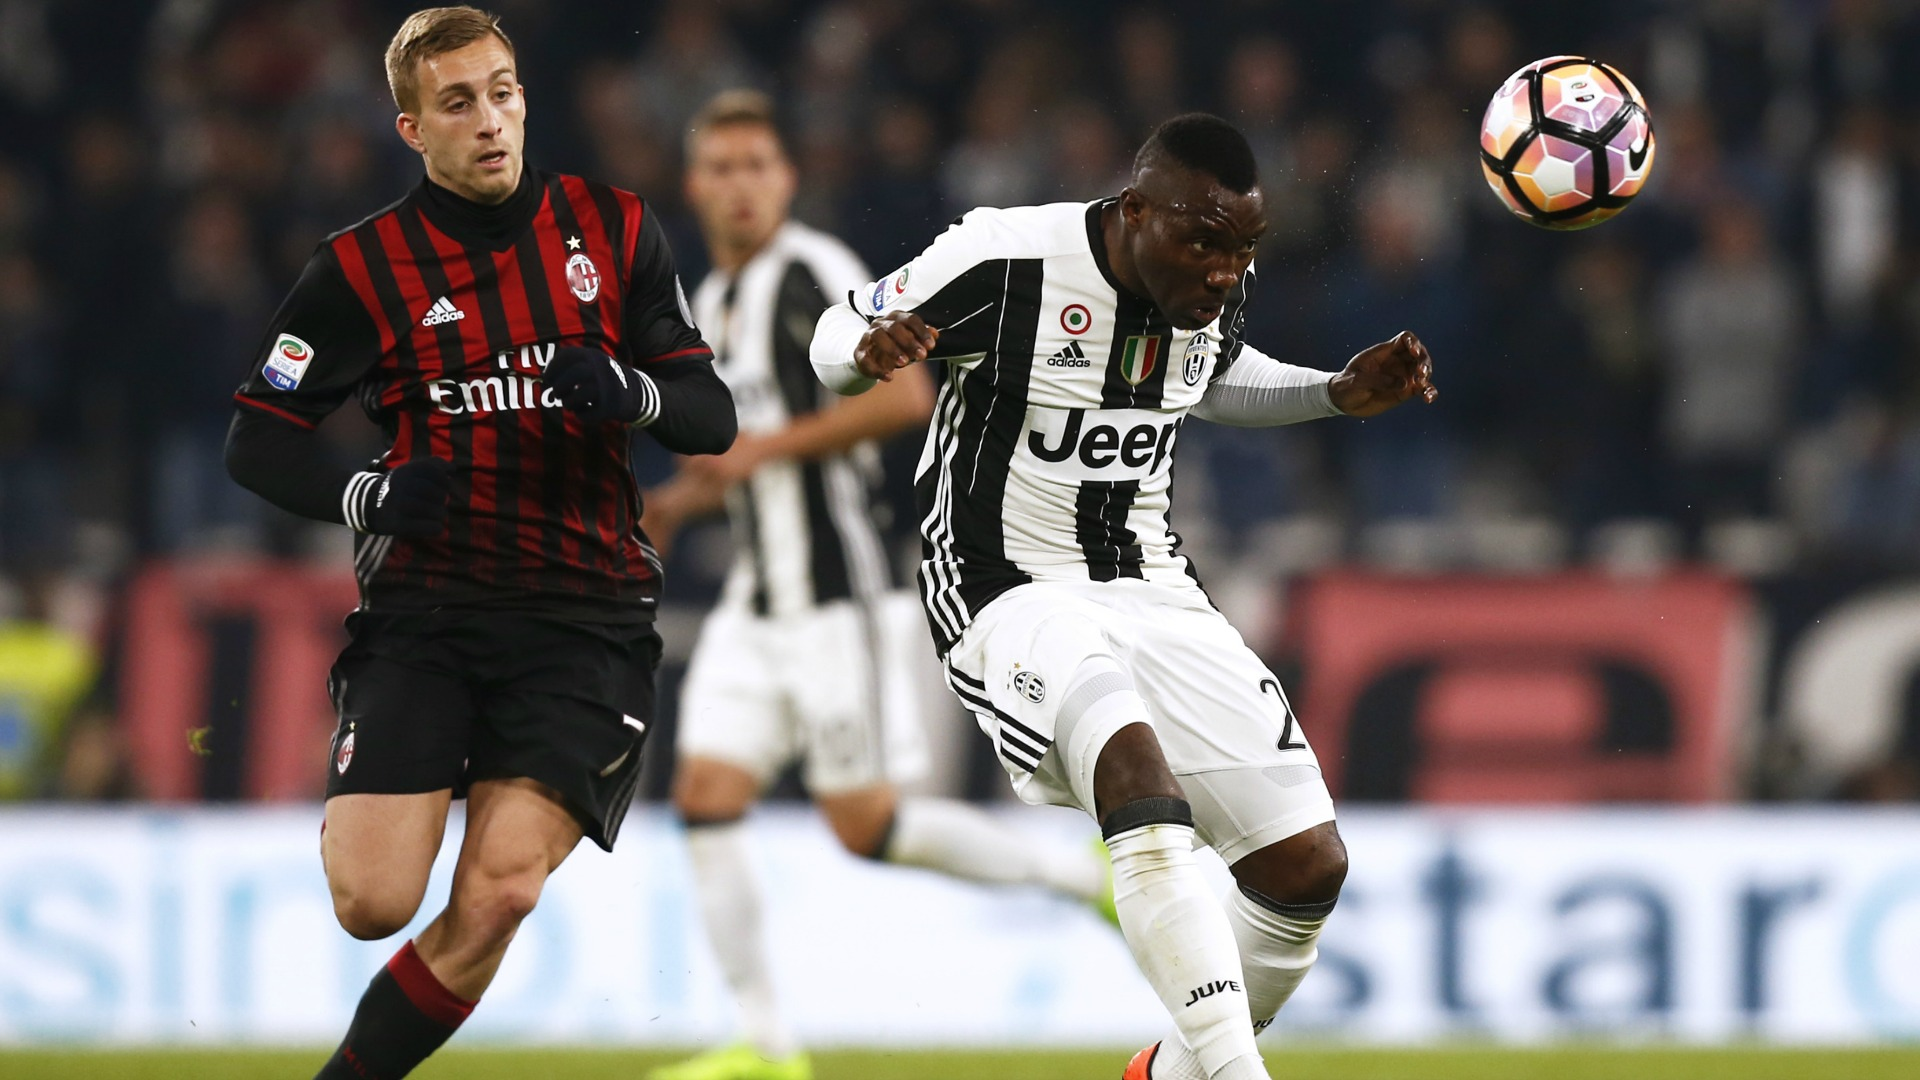 Gerard Deulofeu Asamoah Juventus Milan Serie A